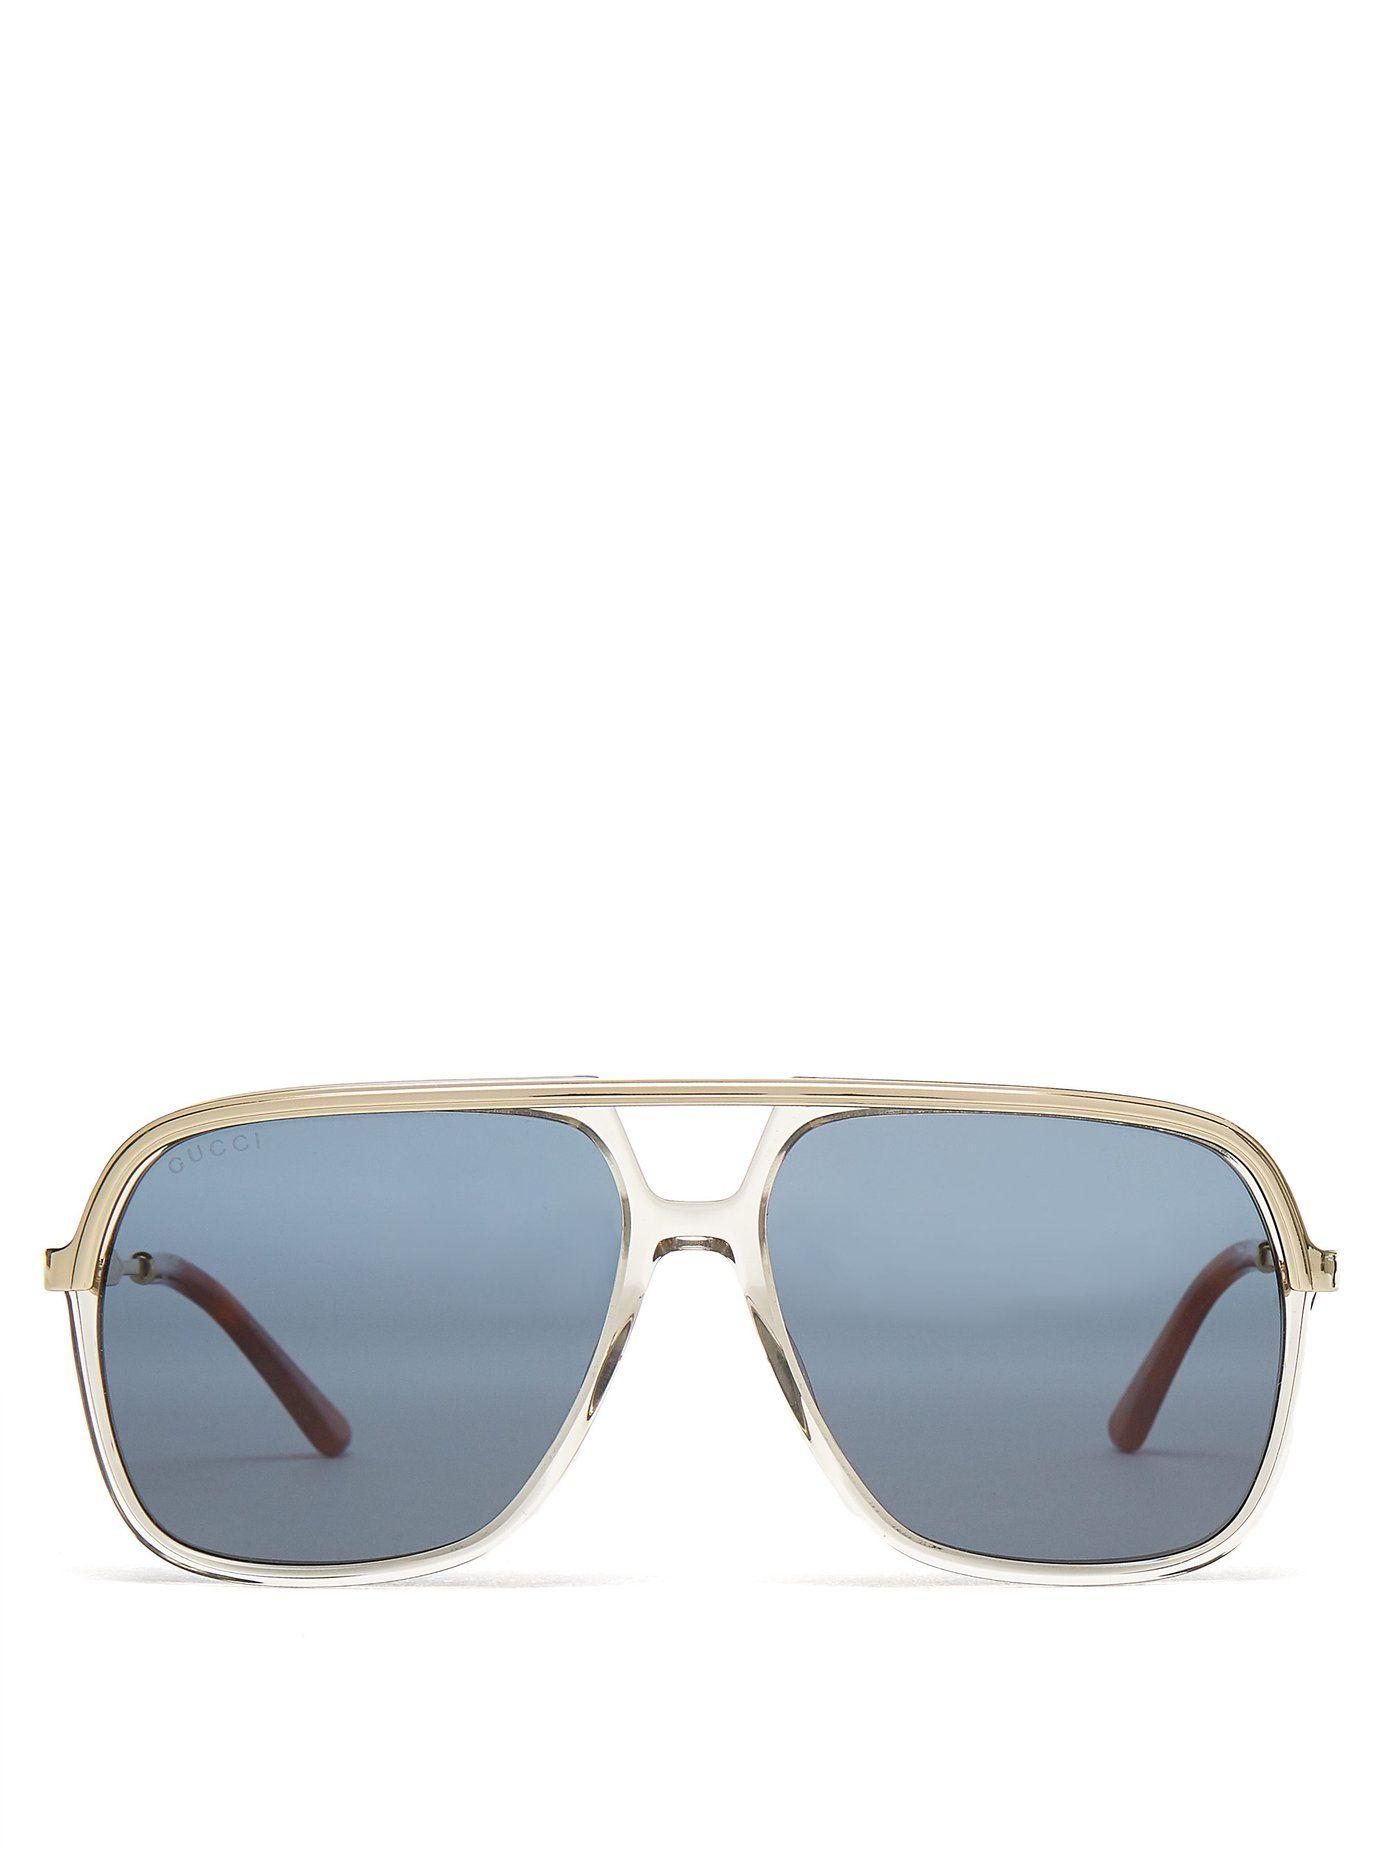 9eeef62351e Gucci Rectangular-frame acetate and metal sunglasses